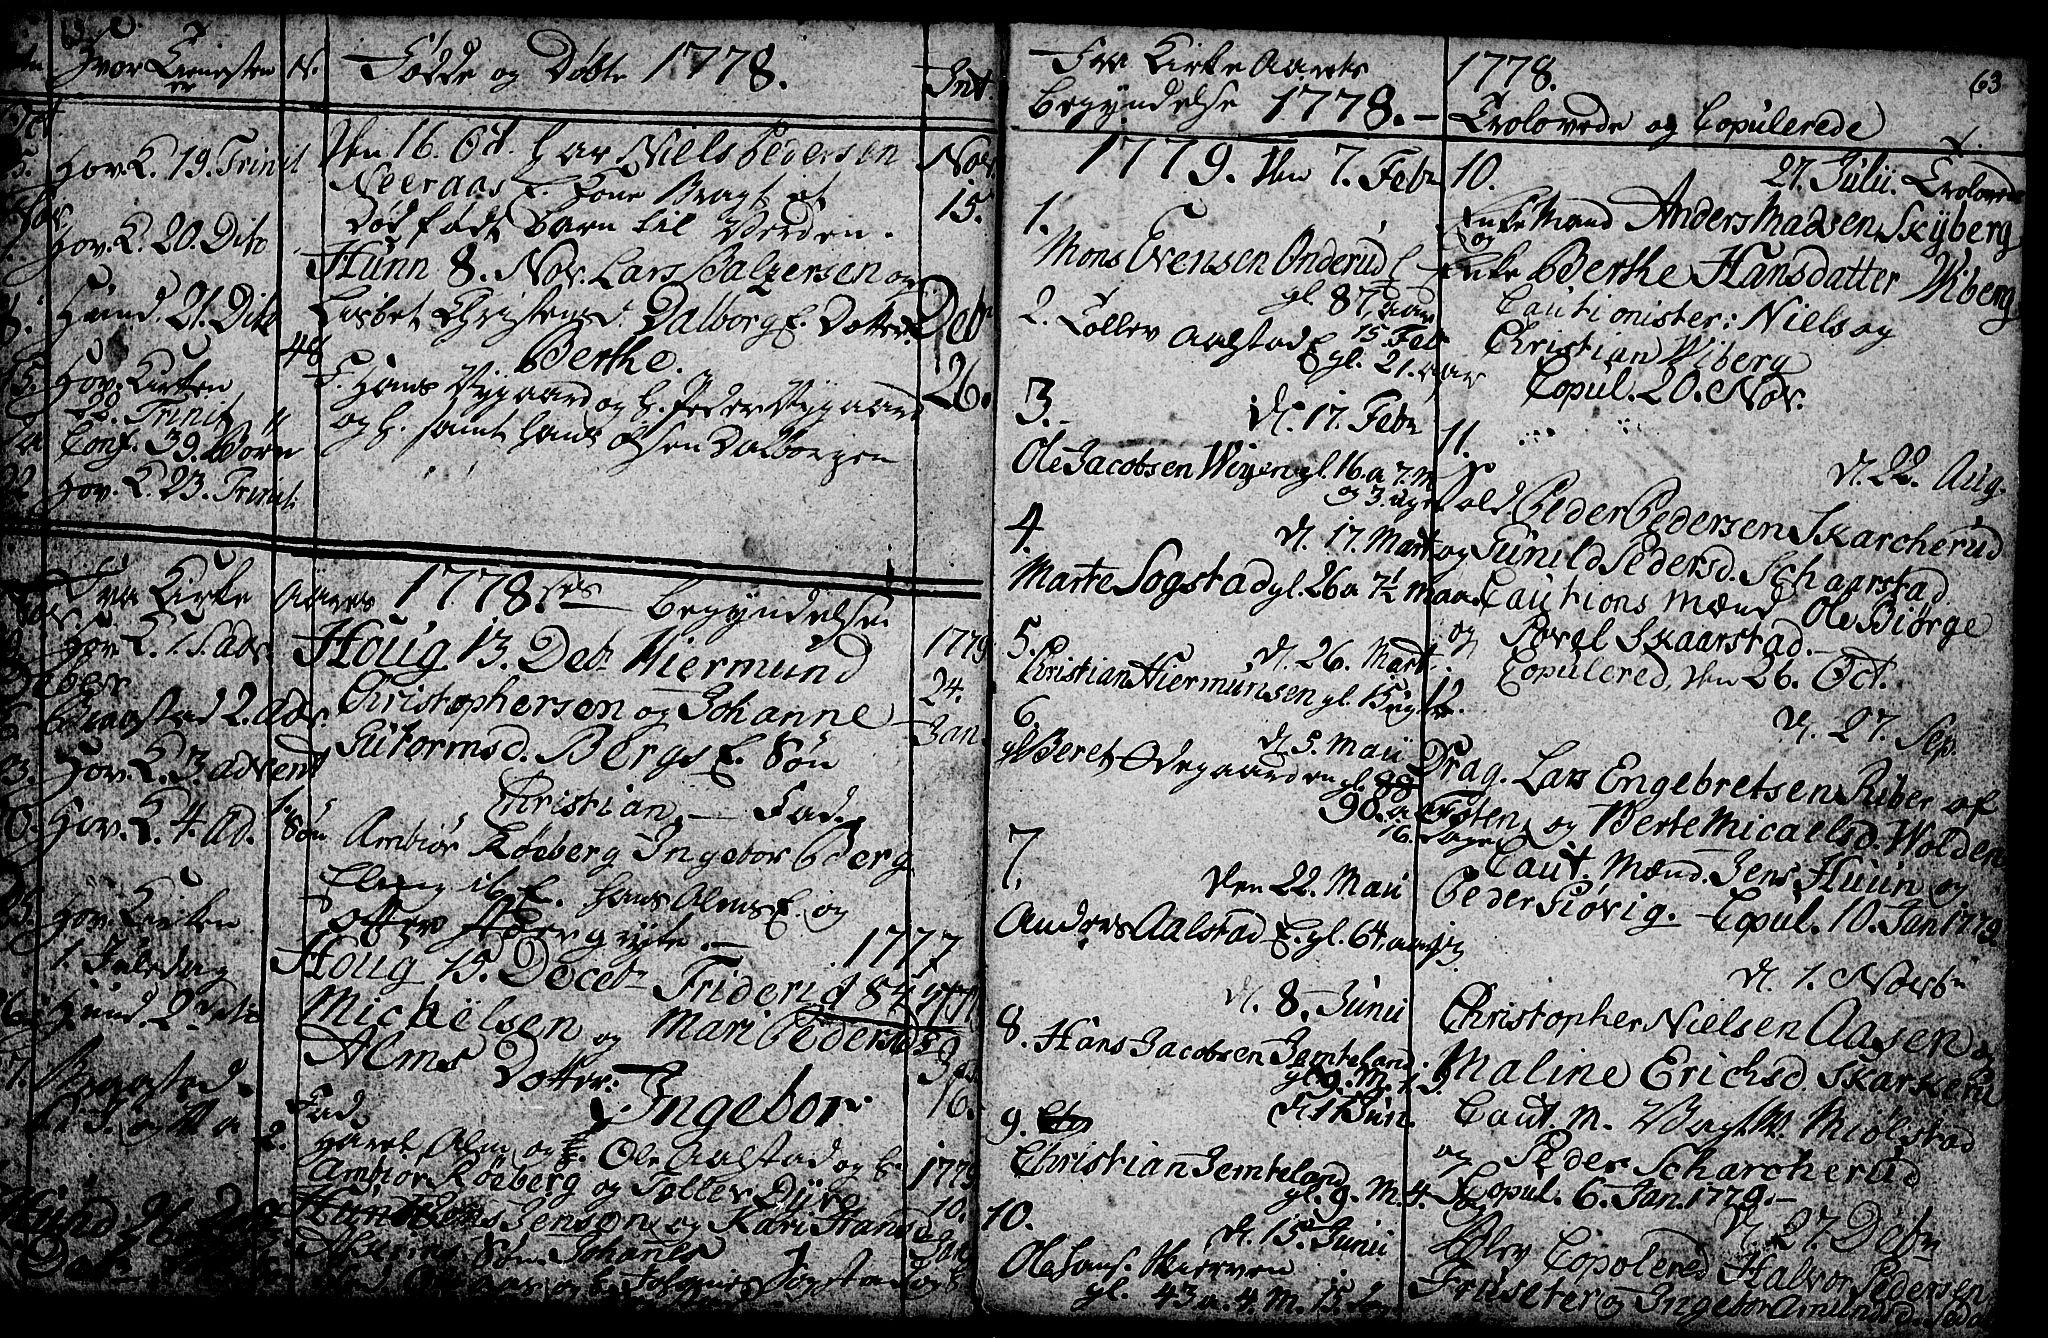 SAH, Vardal prestekontor, H/Ha/Hab/L0001: Klokkerbok nr. 1, 1771-1790, s. 62-63